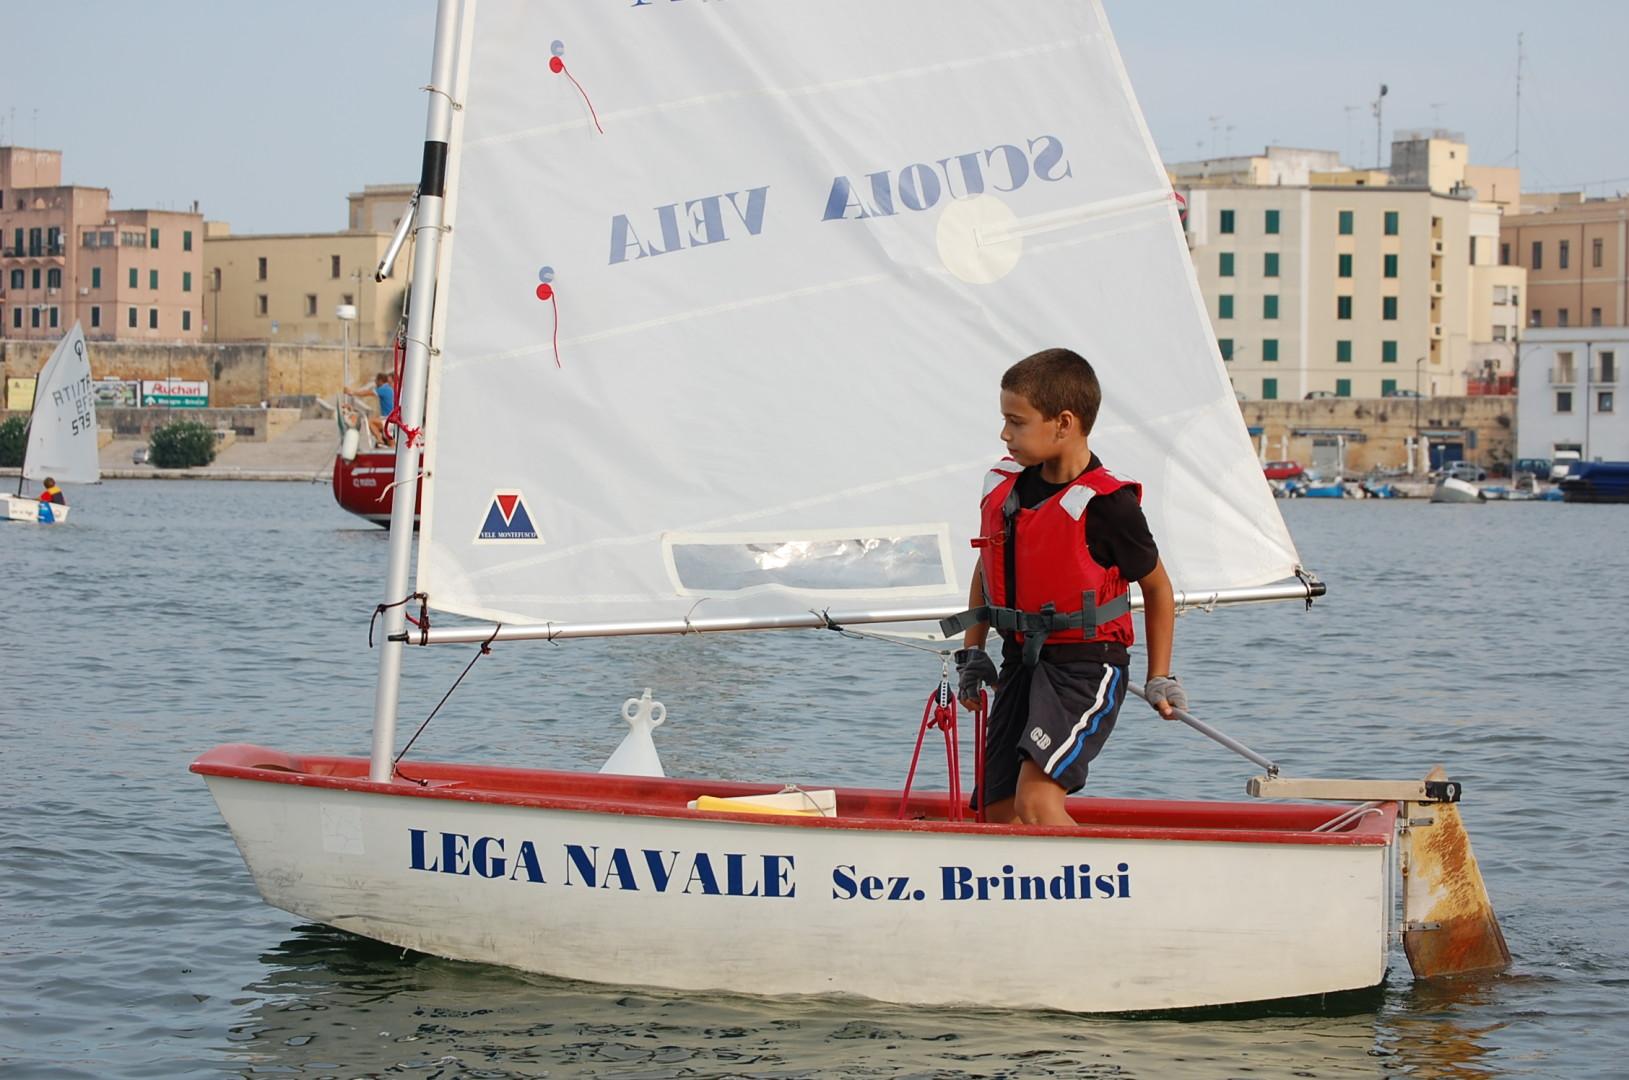 Scuola-di-vela-lega-navale-LNI-Brindisi (1)